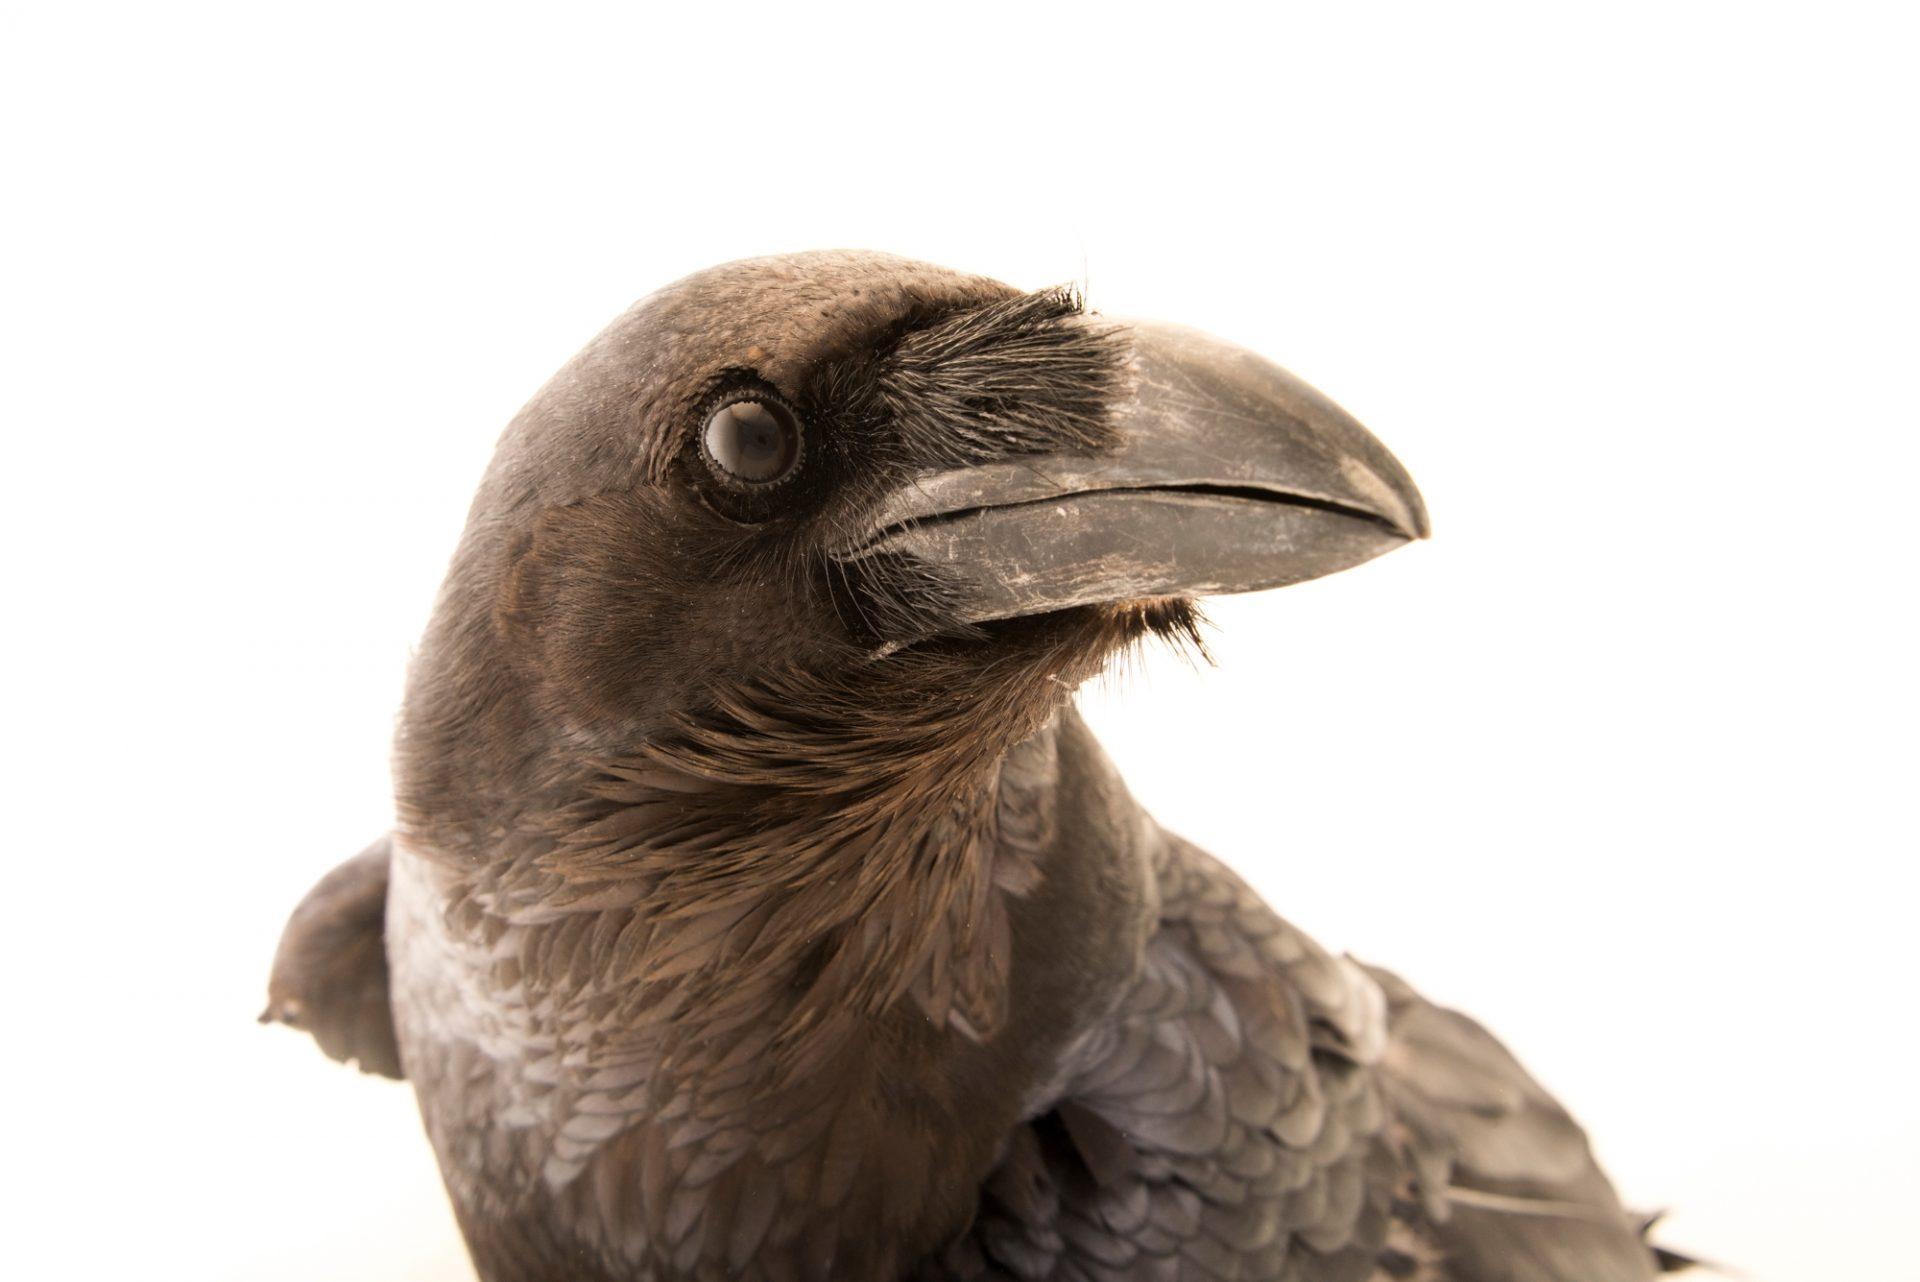 Photo: Common raven (Corvus corax corax) at Lisbon Zoo.